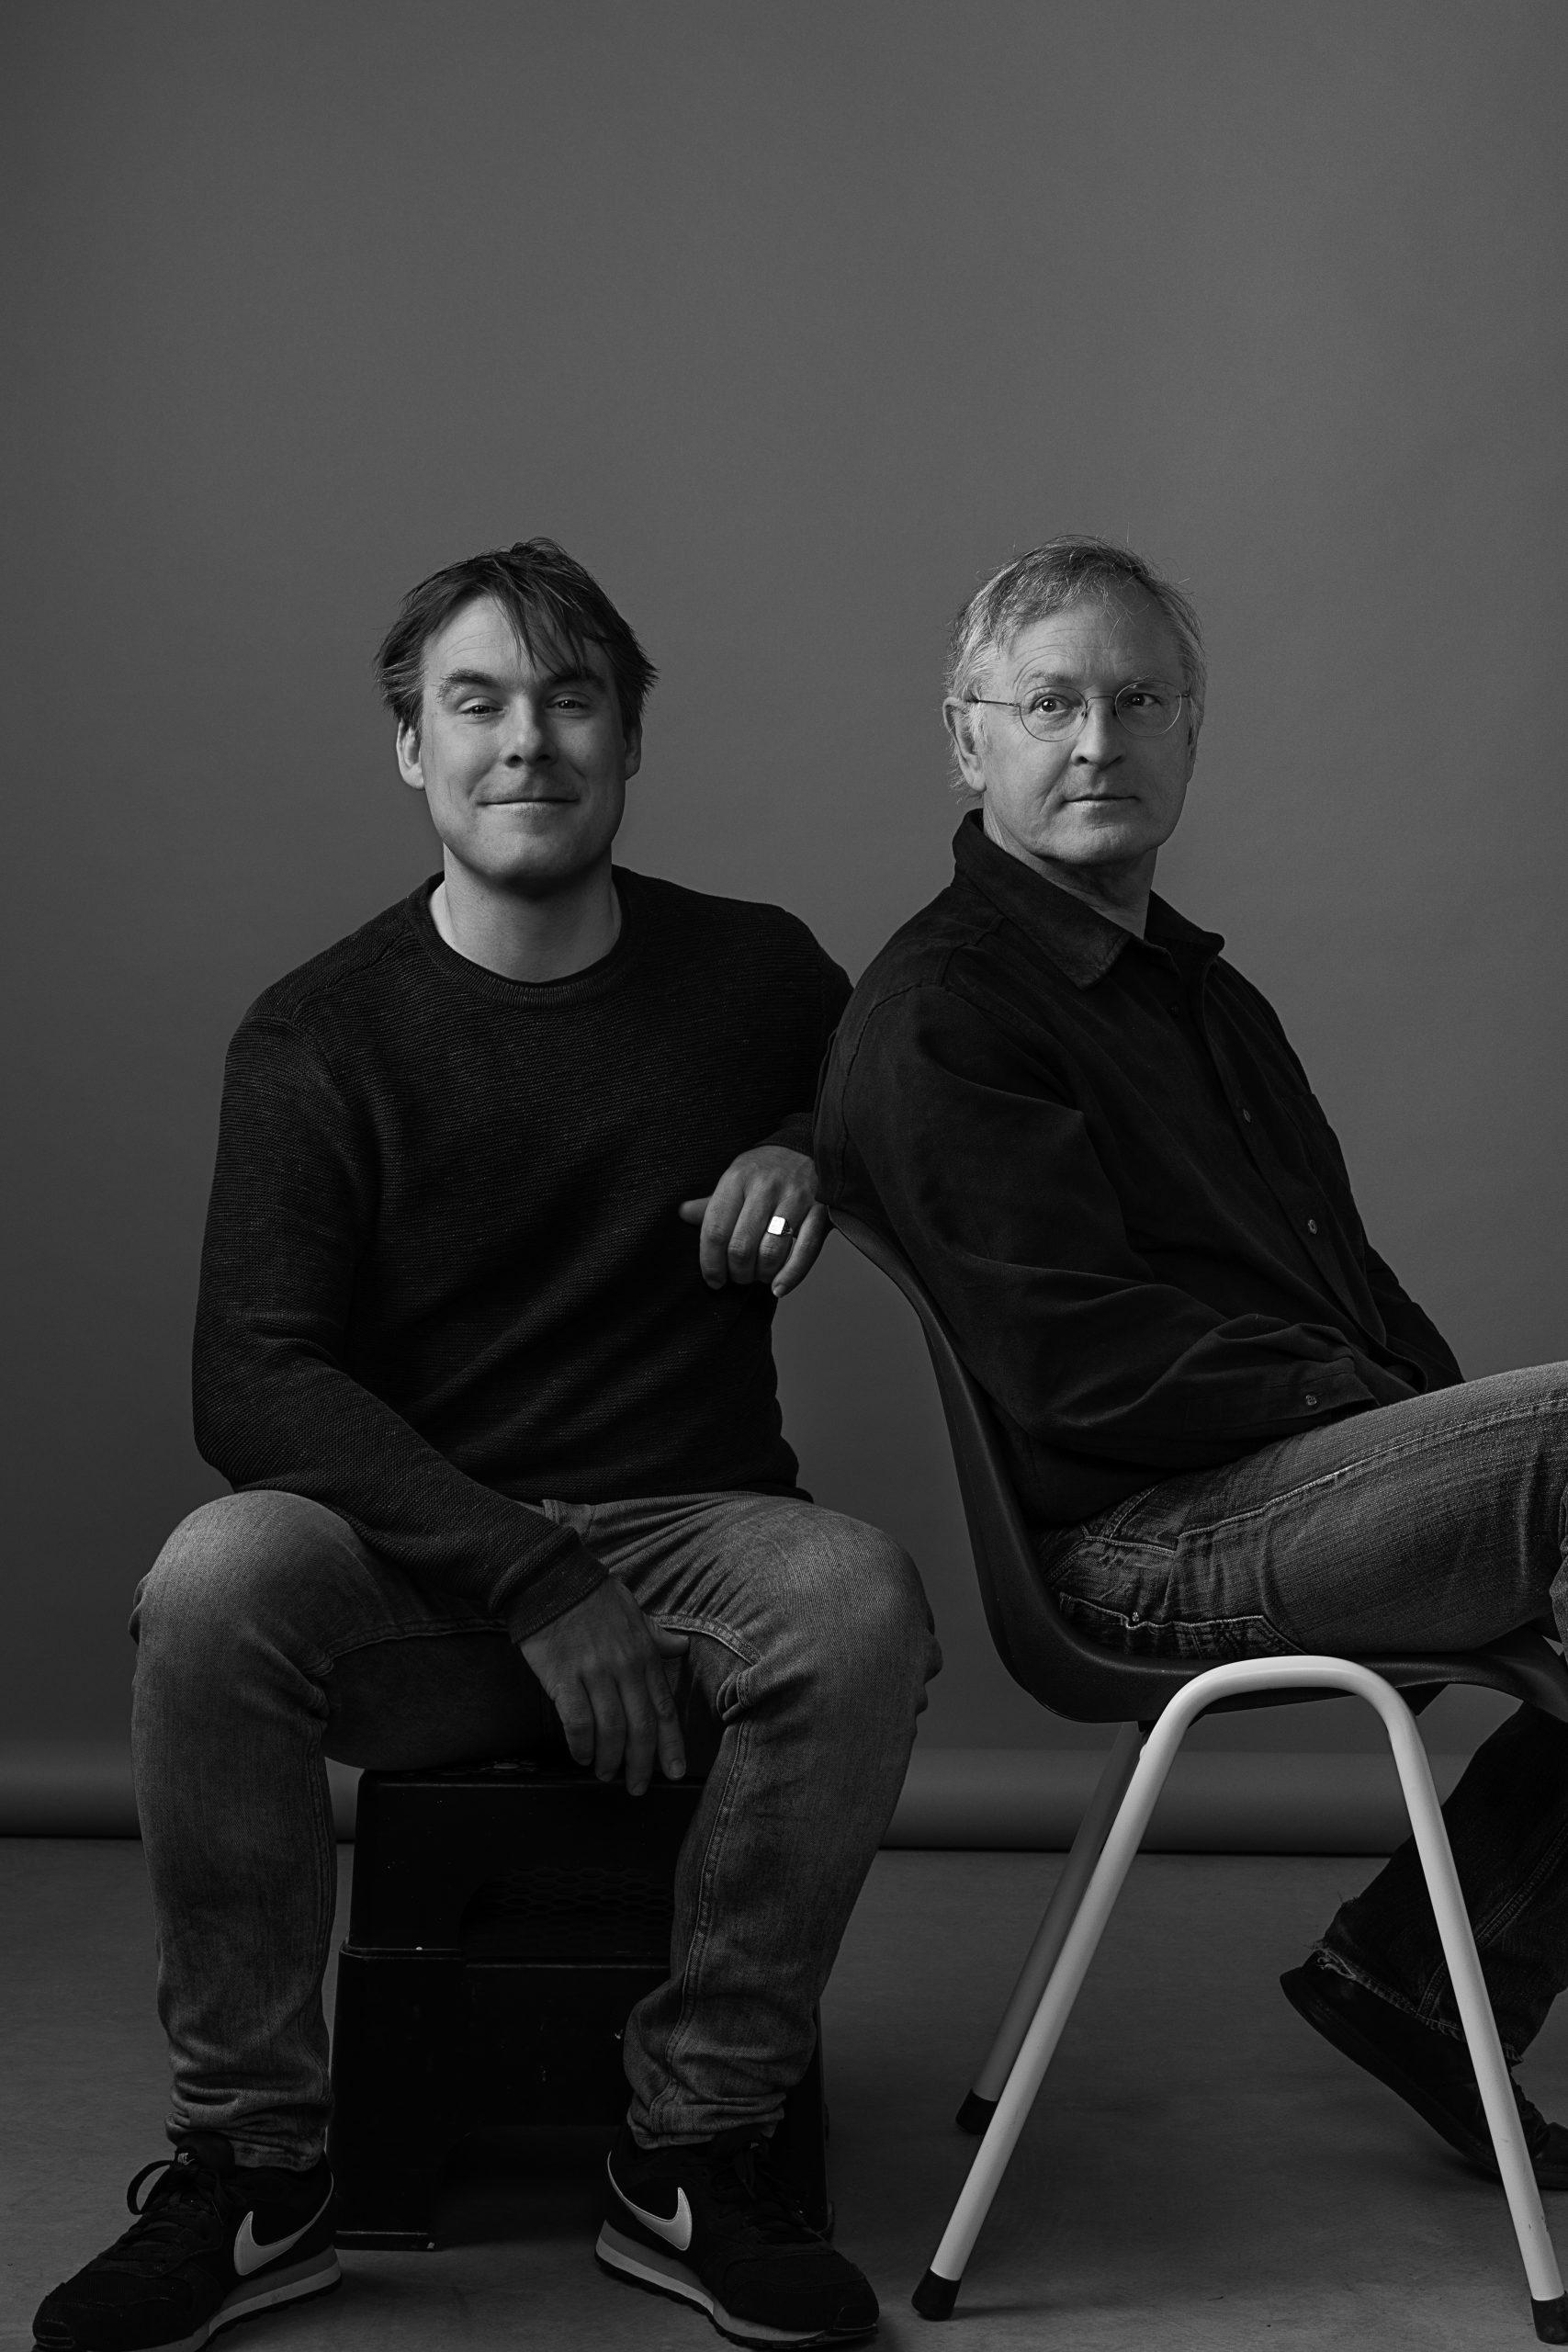 Jan Baanstra en Jack Timmermans, fotografie: Willeke Machiels